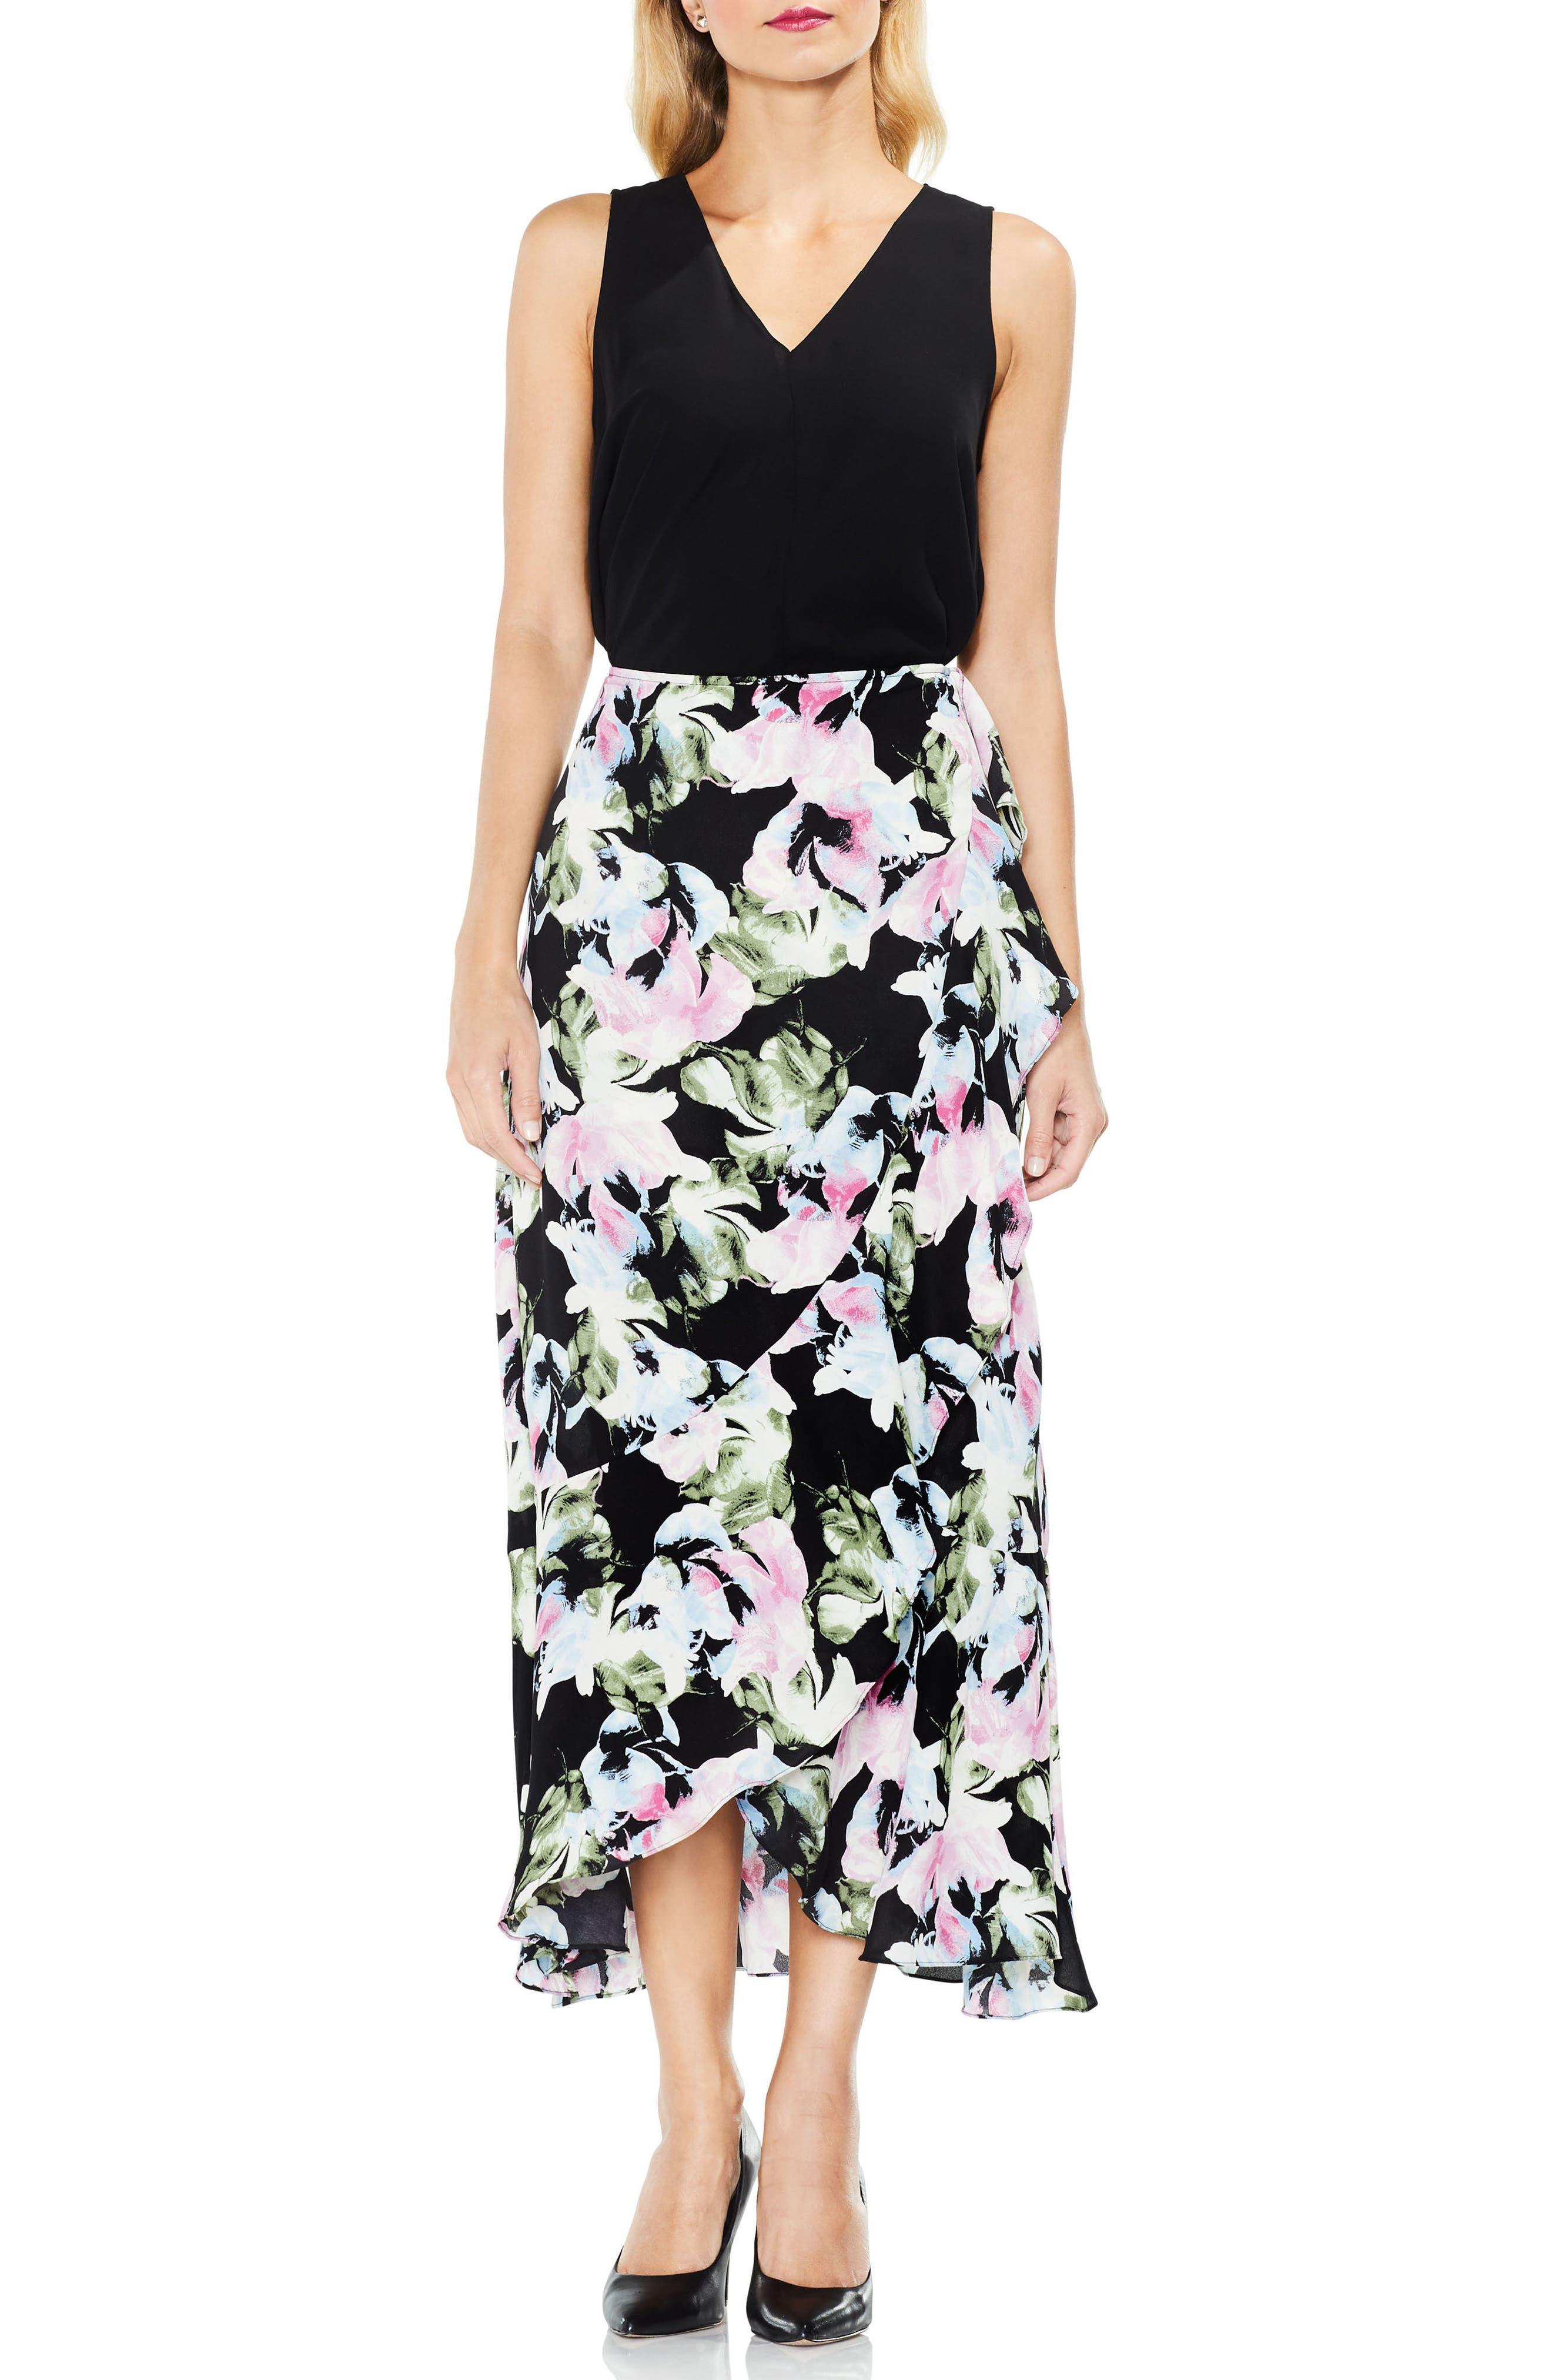 Glacier Floral Ruffle Skirt,                         Main,                         color, 010